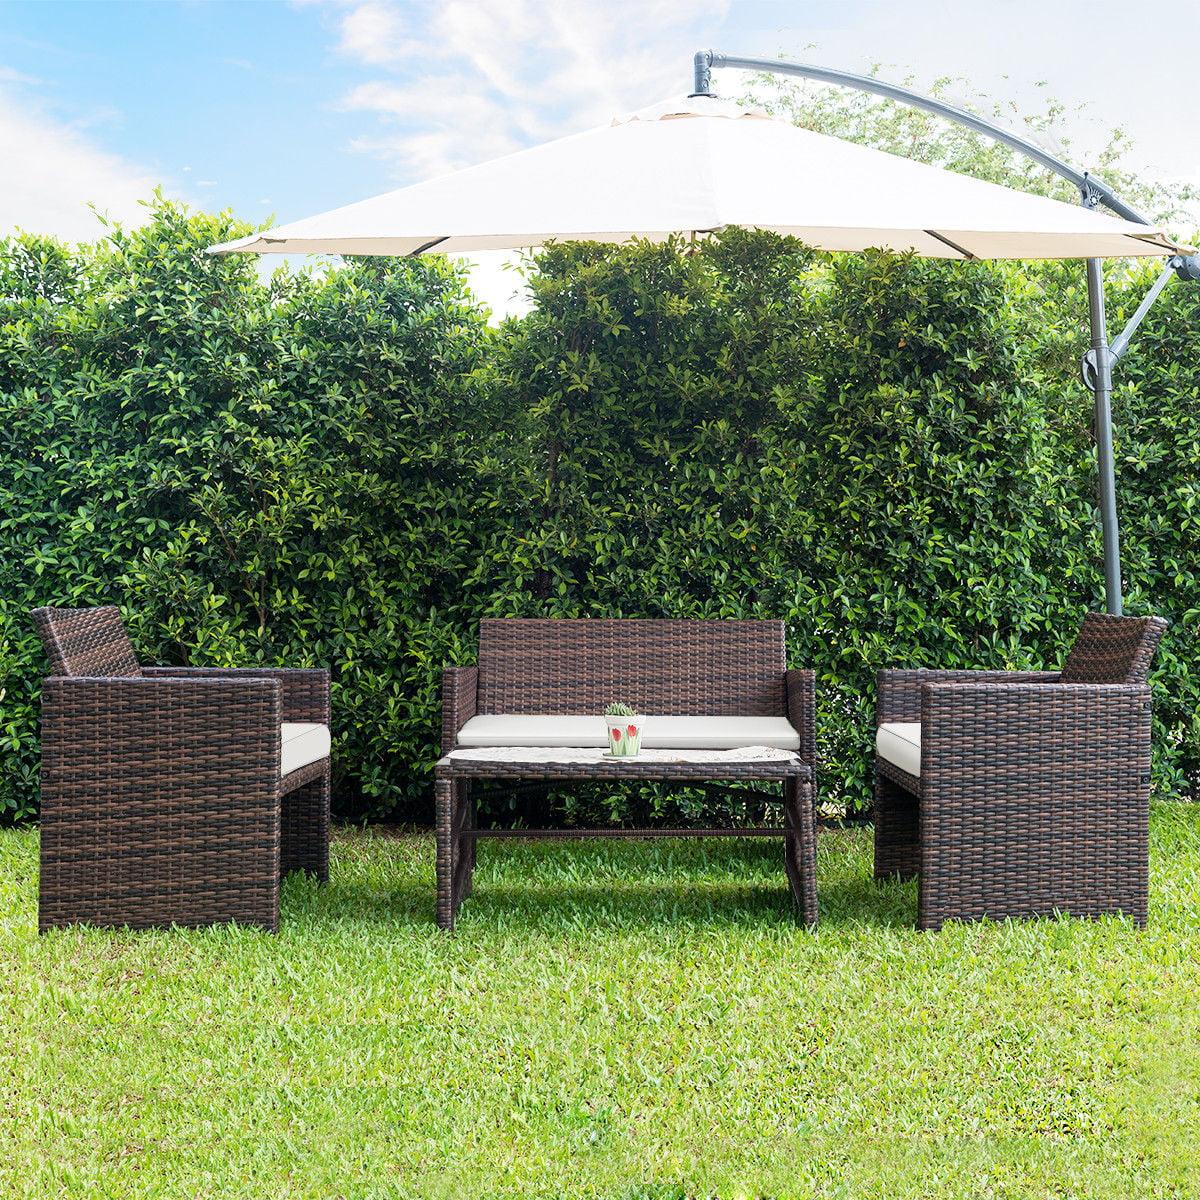 extraordinary outdoor wicker patio furniture sets | Gymax 4 PC Rattan Patio Furniture Set Garden Lawn Sofa ...